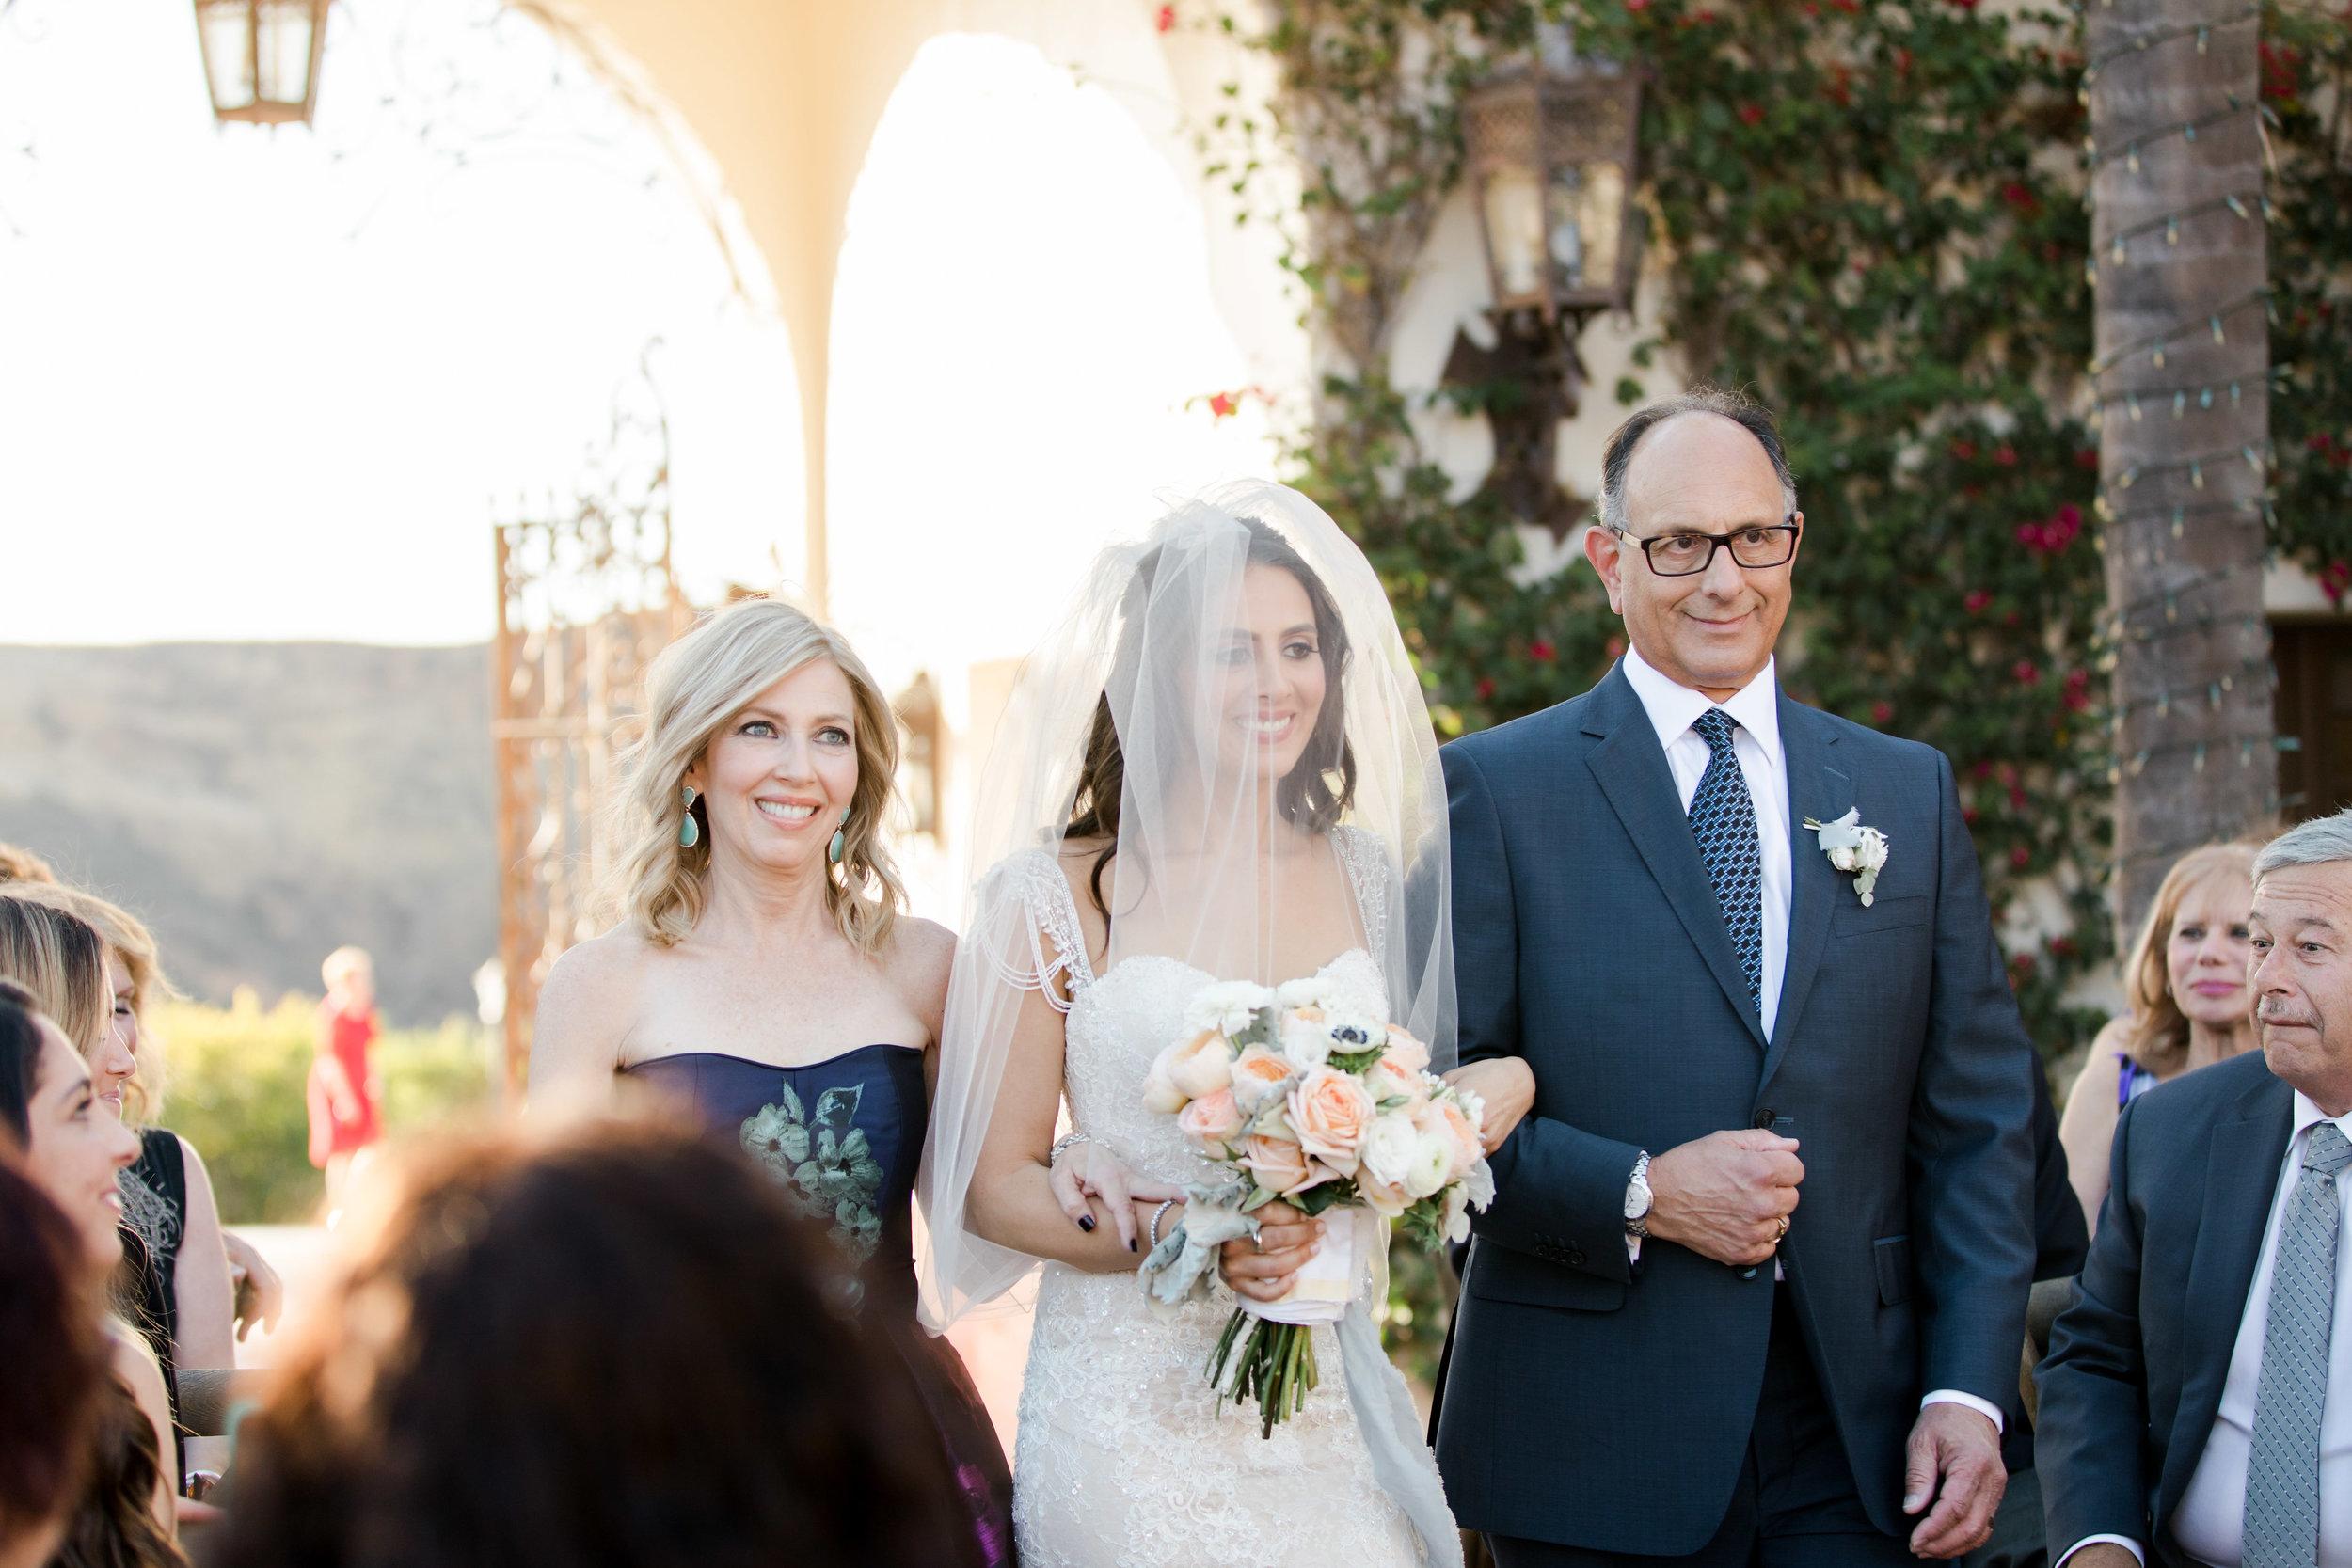 JennyQuicksallPhotography_www.jennyquicksall.com_HummingbirdNestRanchWedding_-467.jpg